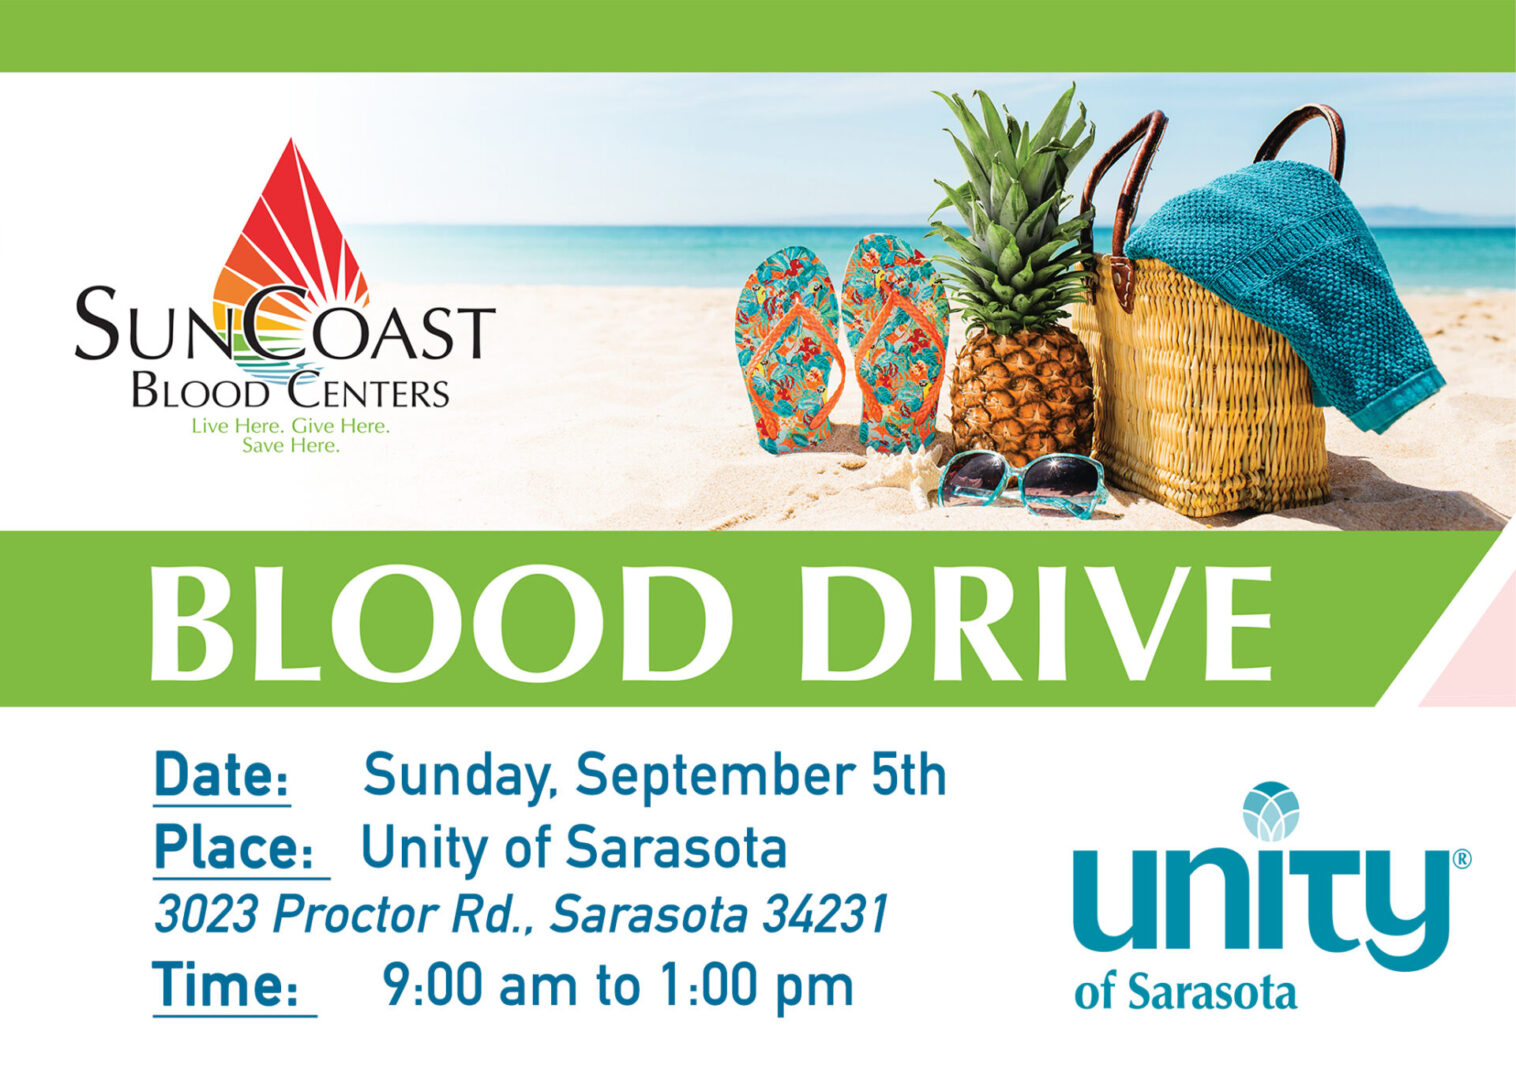 SunCoast Blood Drive at Unity of Sarasota